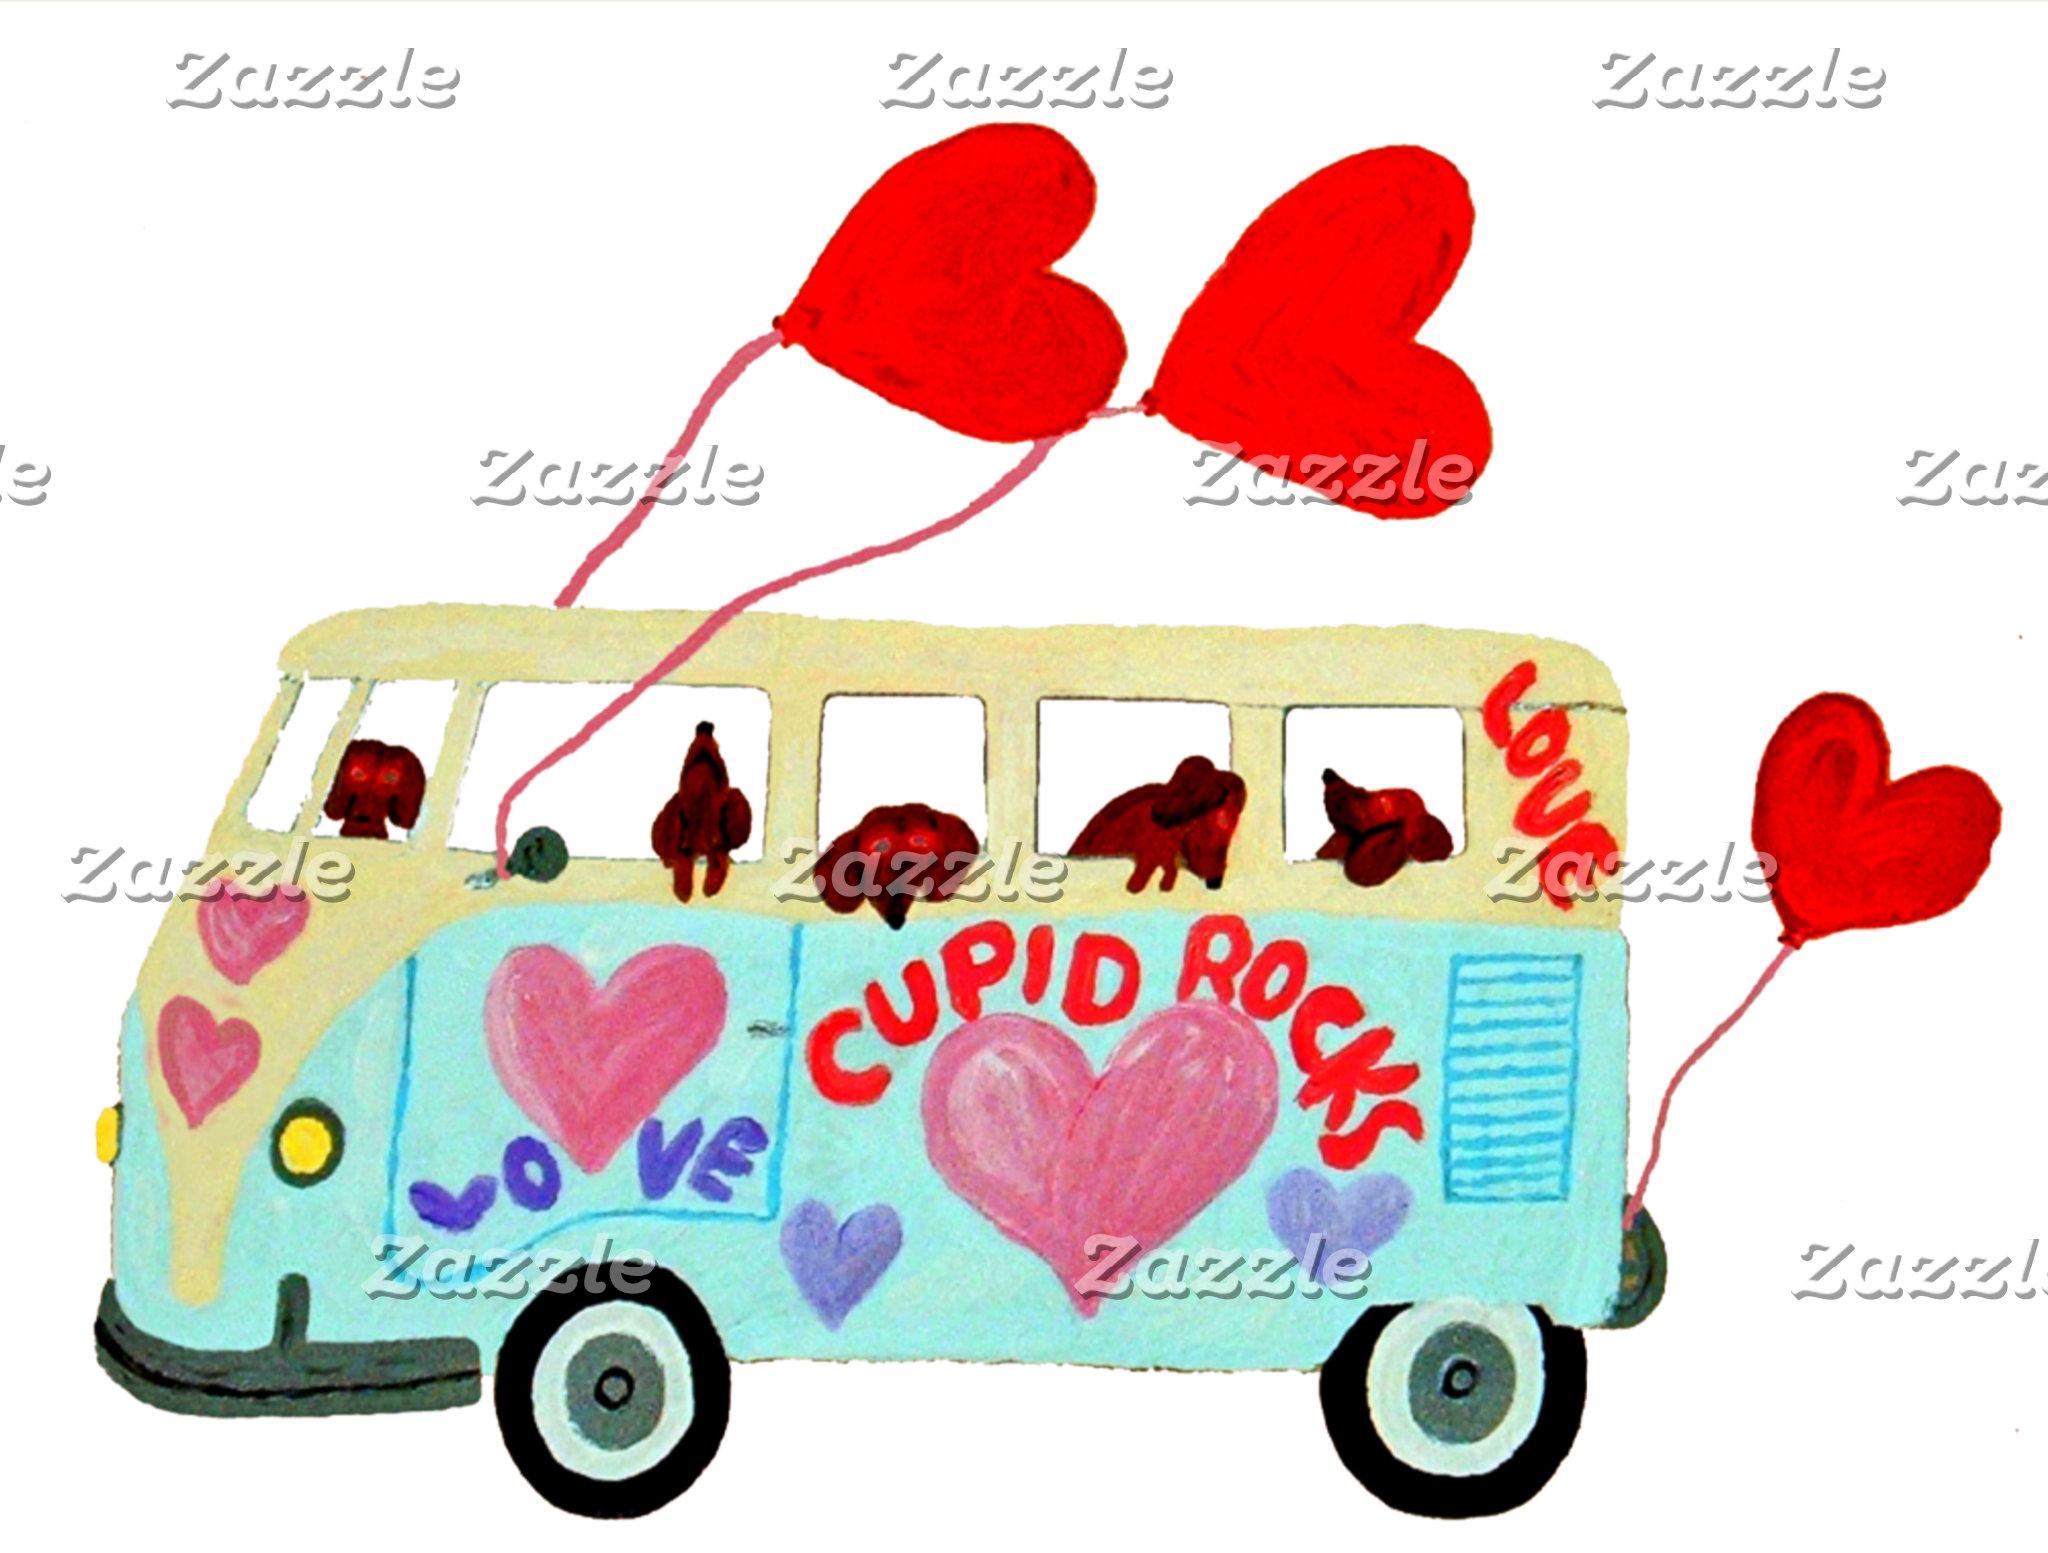 Dachshund Valentine Cupids In Their Love Mobile